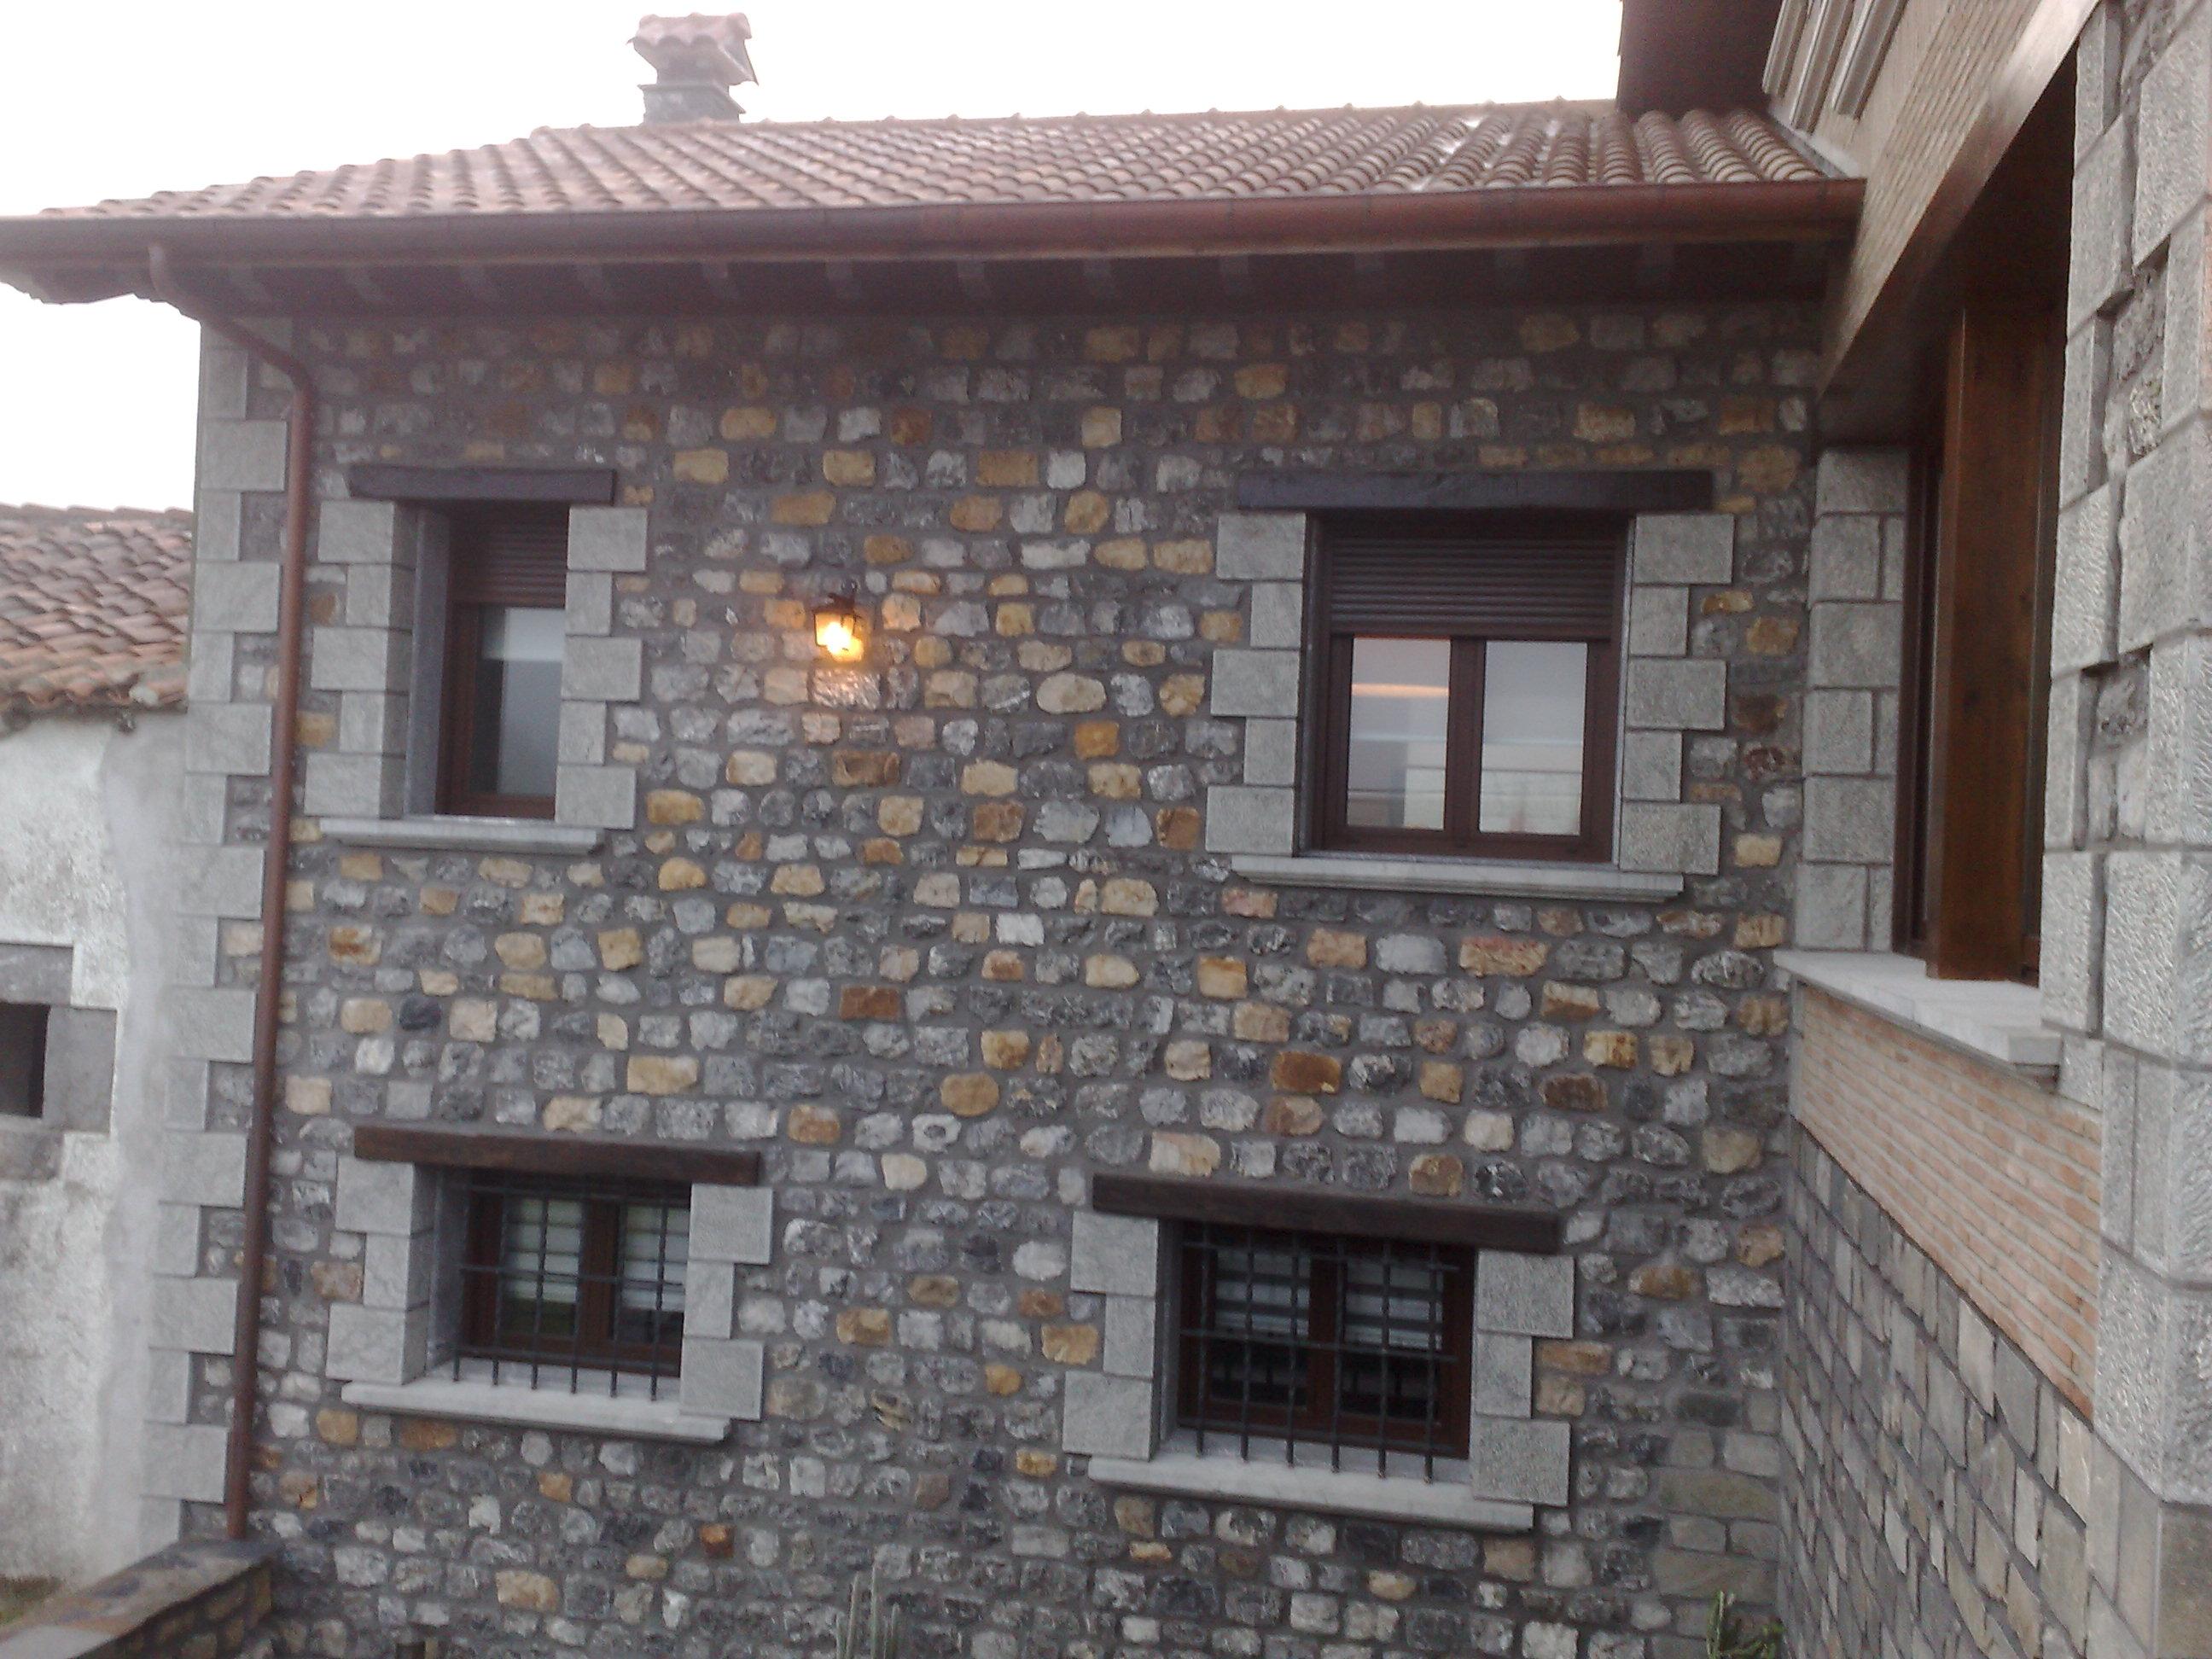 301 moved permanently - Rehabilitacion de casas rurales ...